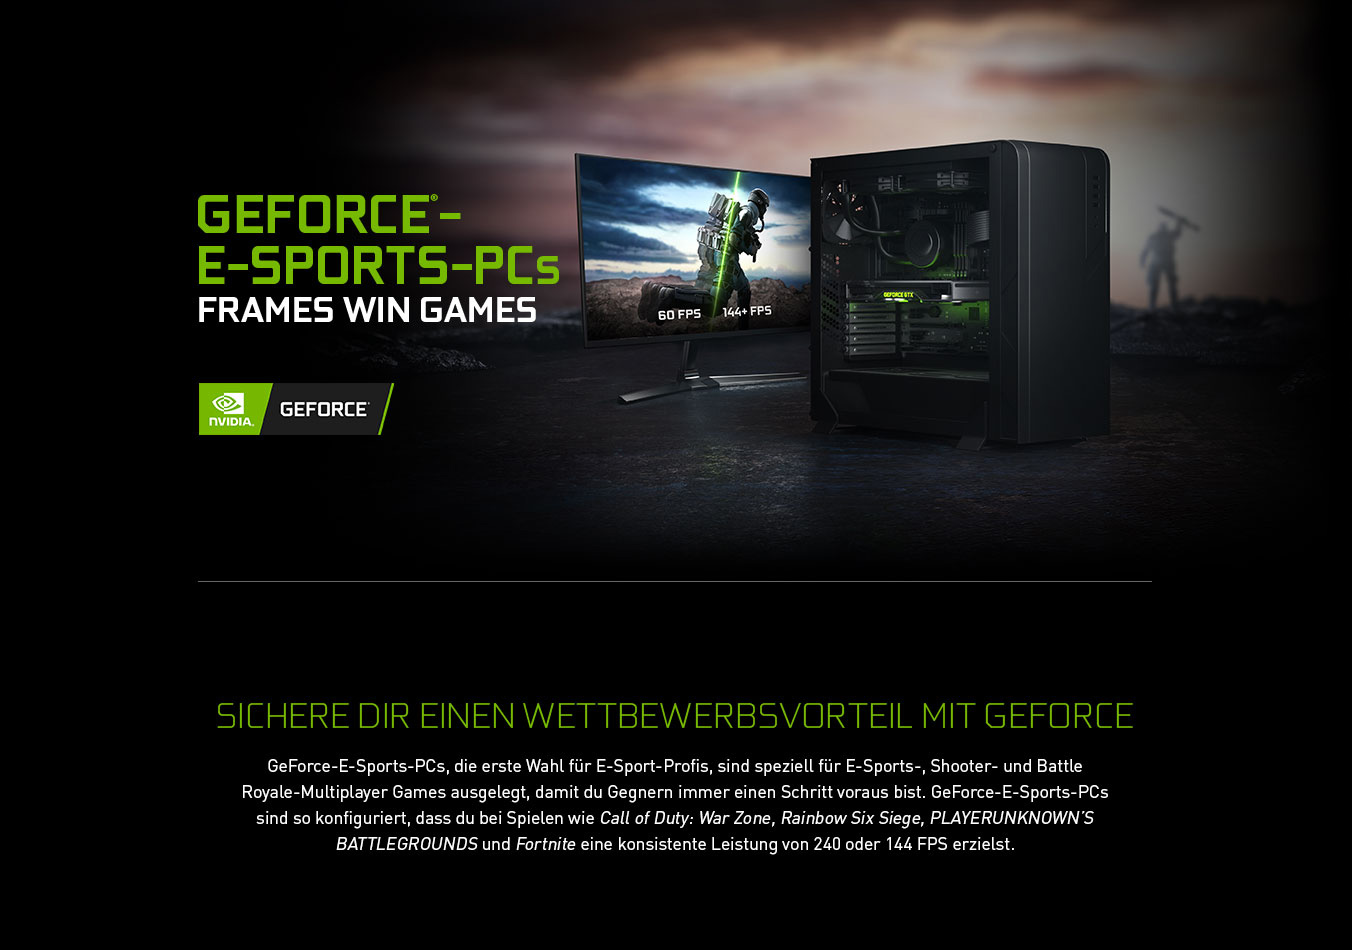 GeForce®-e-SPORTS-PCs: Frames win games - Header image